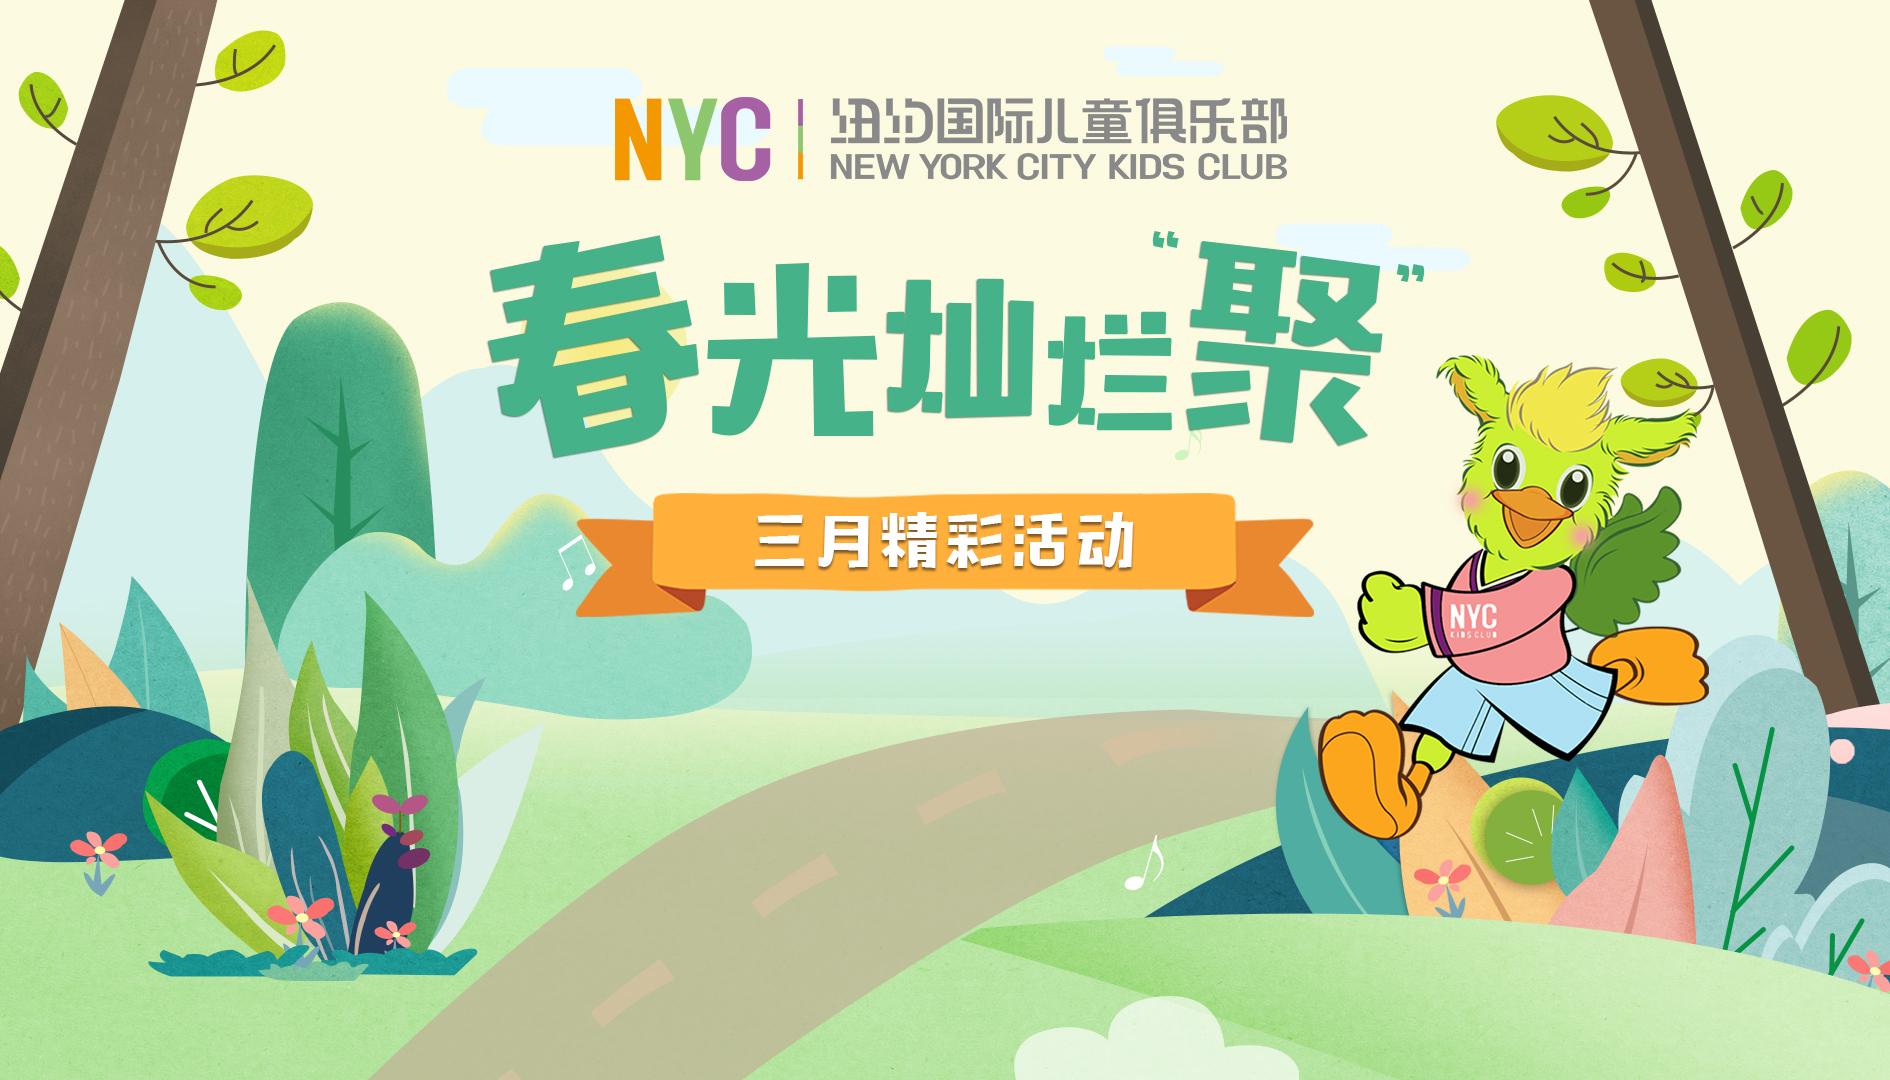 NYC纽约国际重庆早教中心:三月活动预告